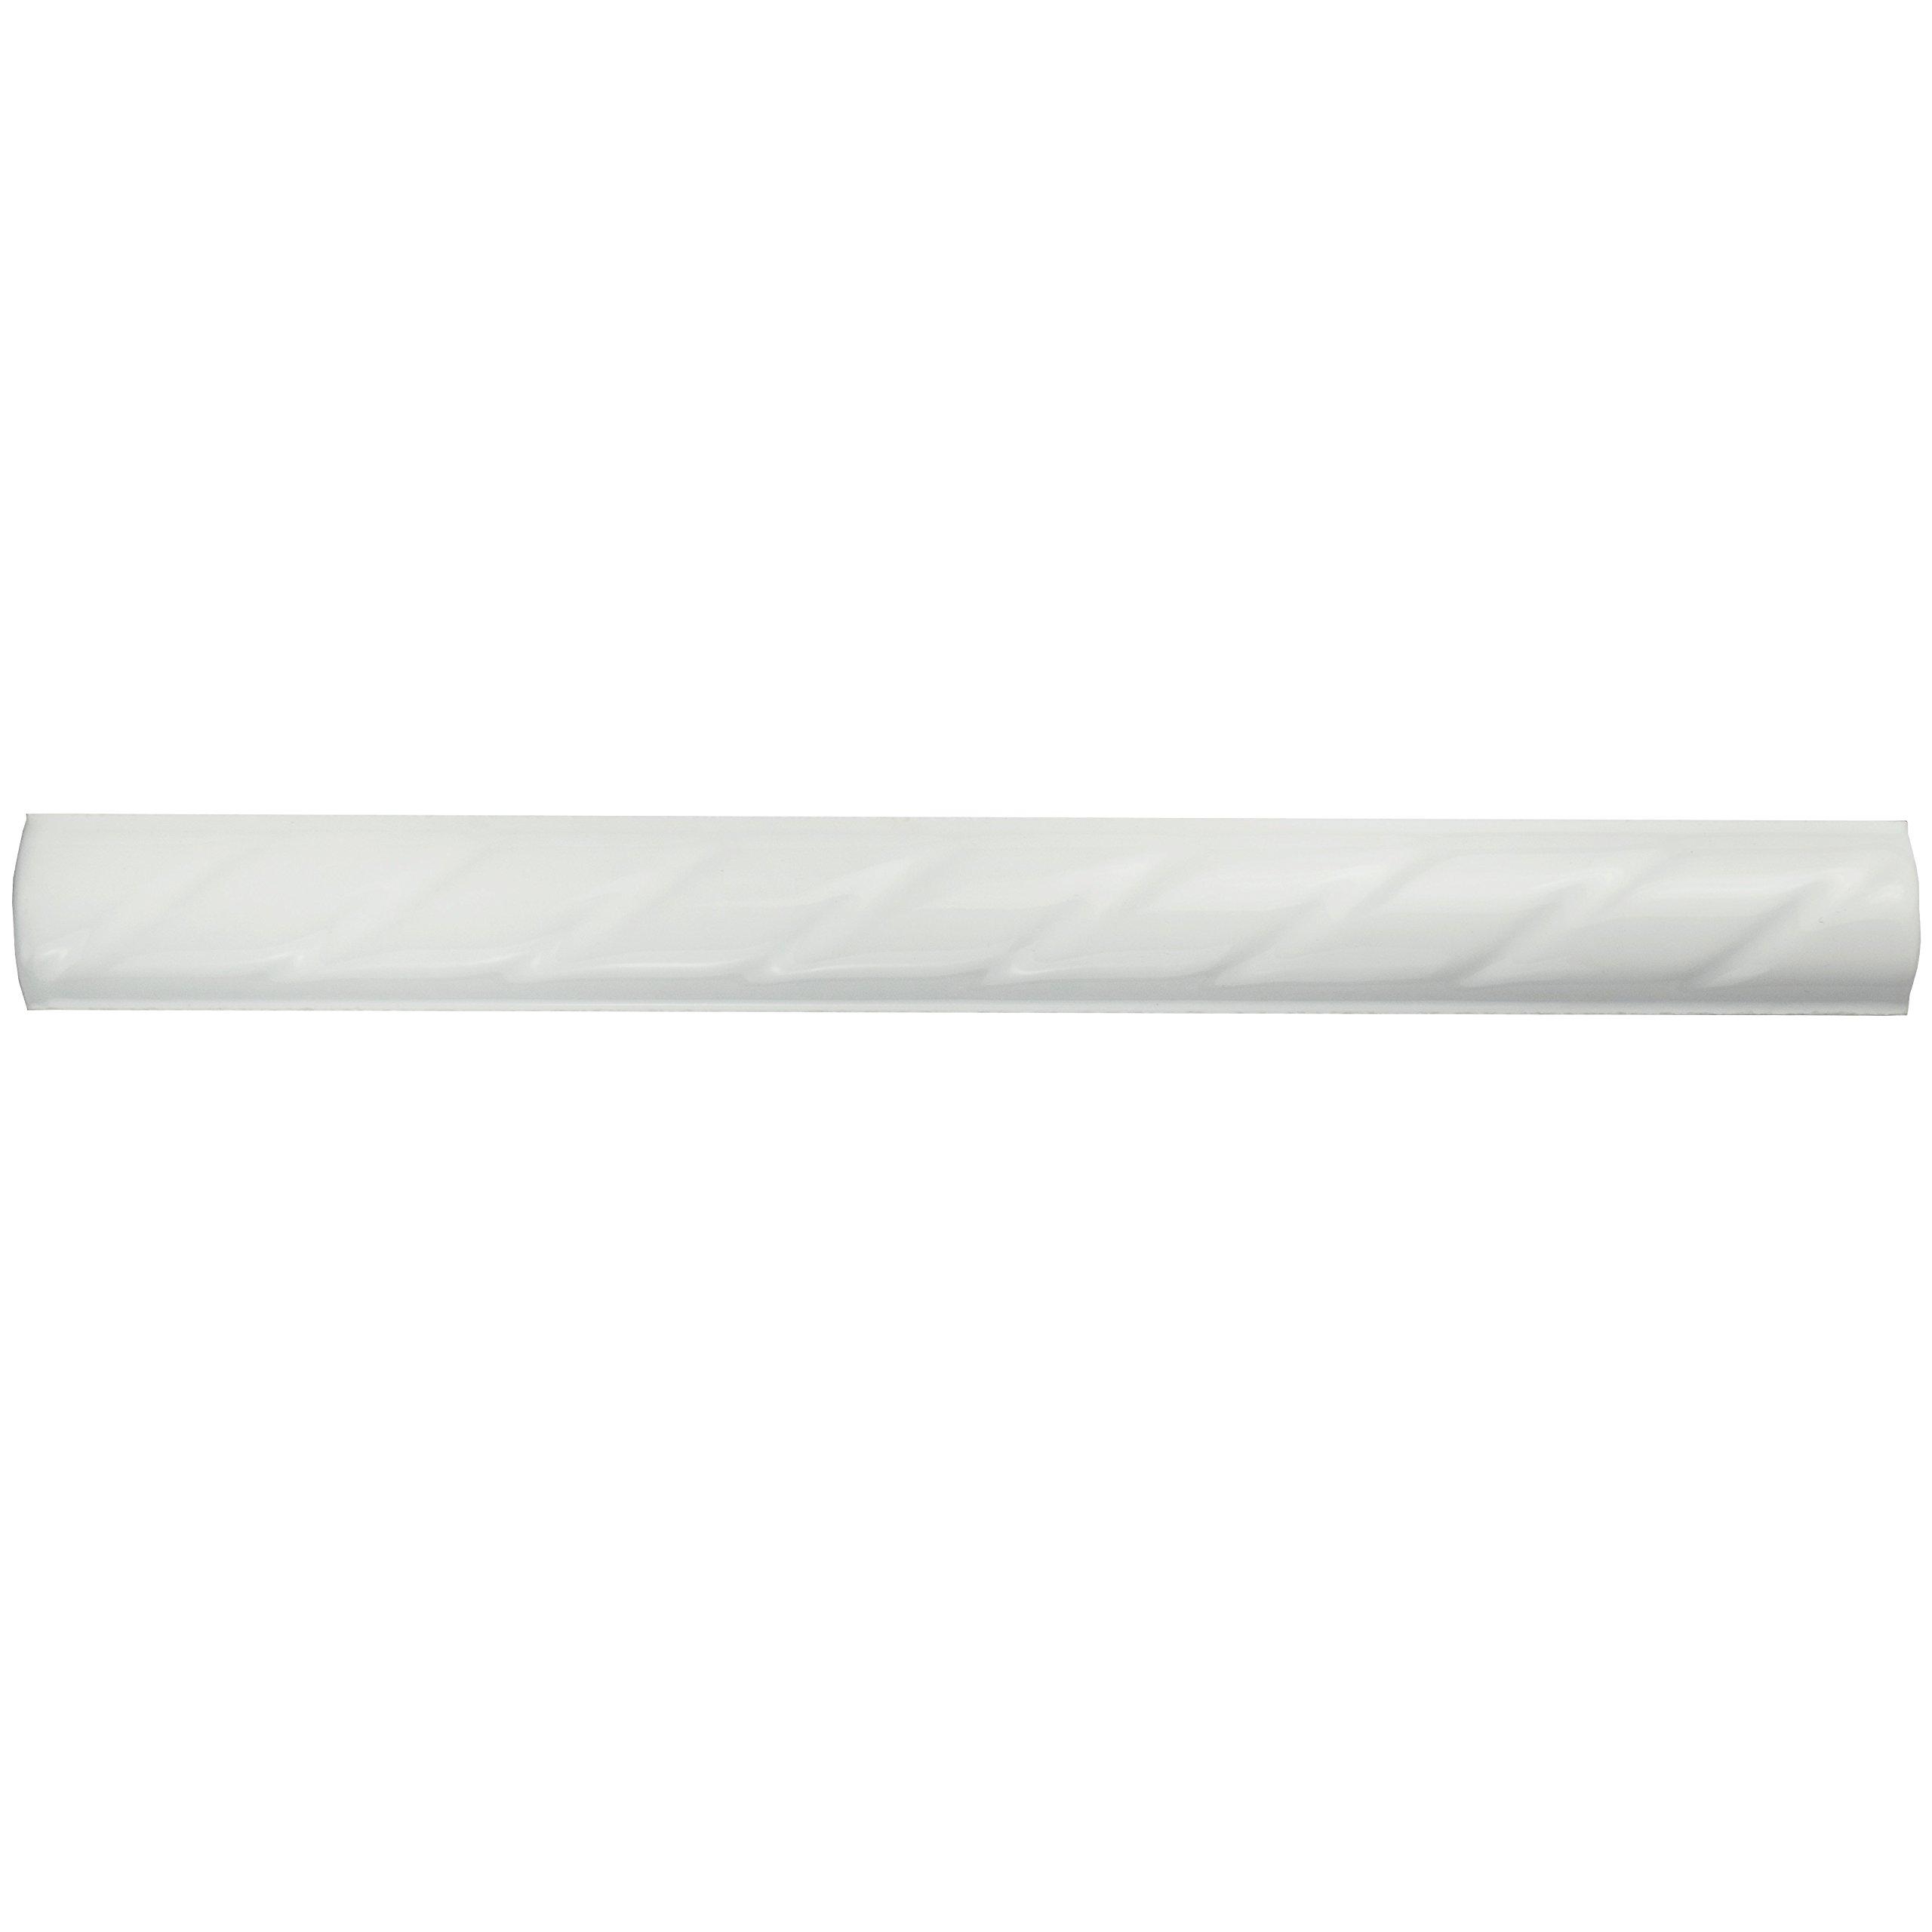 SomerTile WSP10WRP Cuerde Ceramic Pencil Wall Trim Tile, 1'' x 9.75'', White